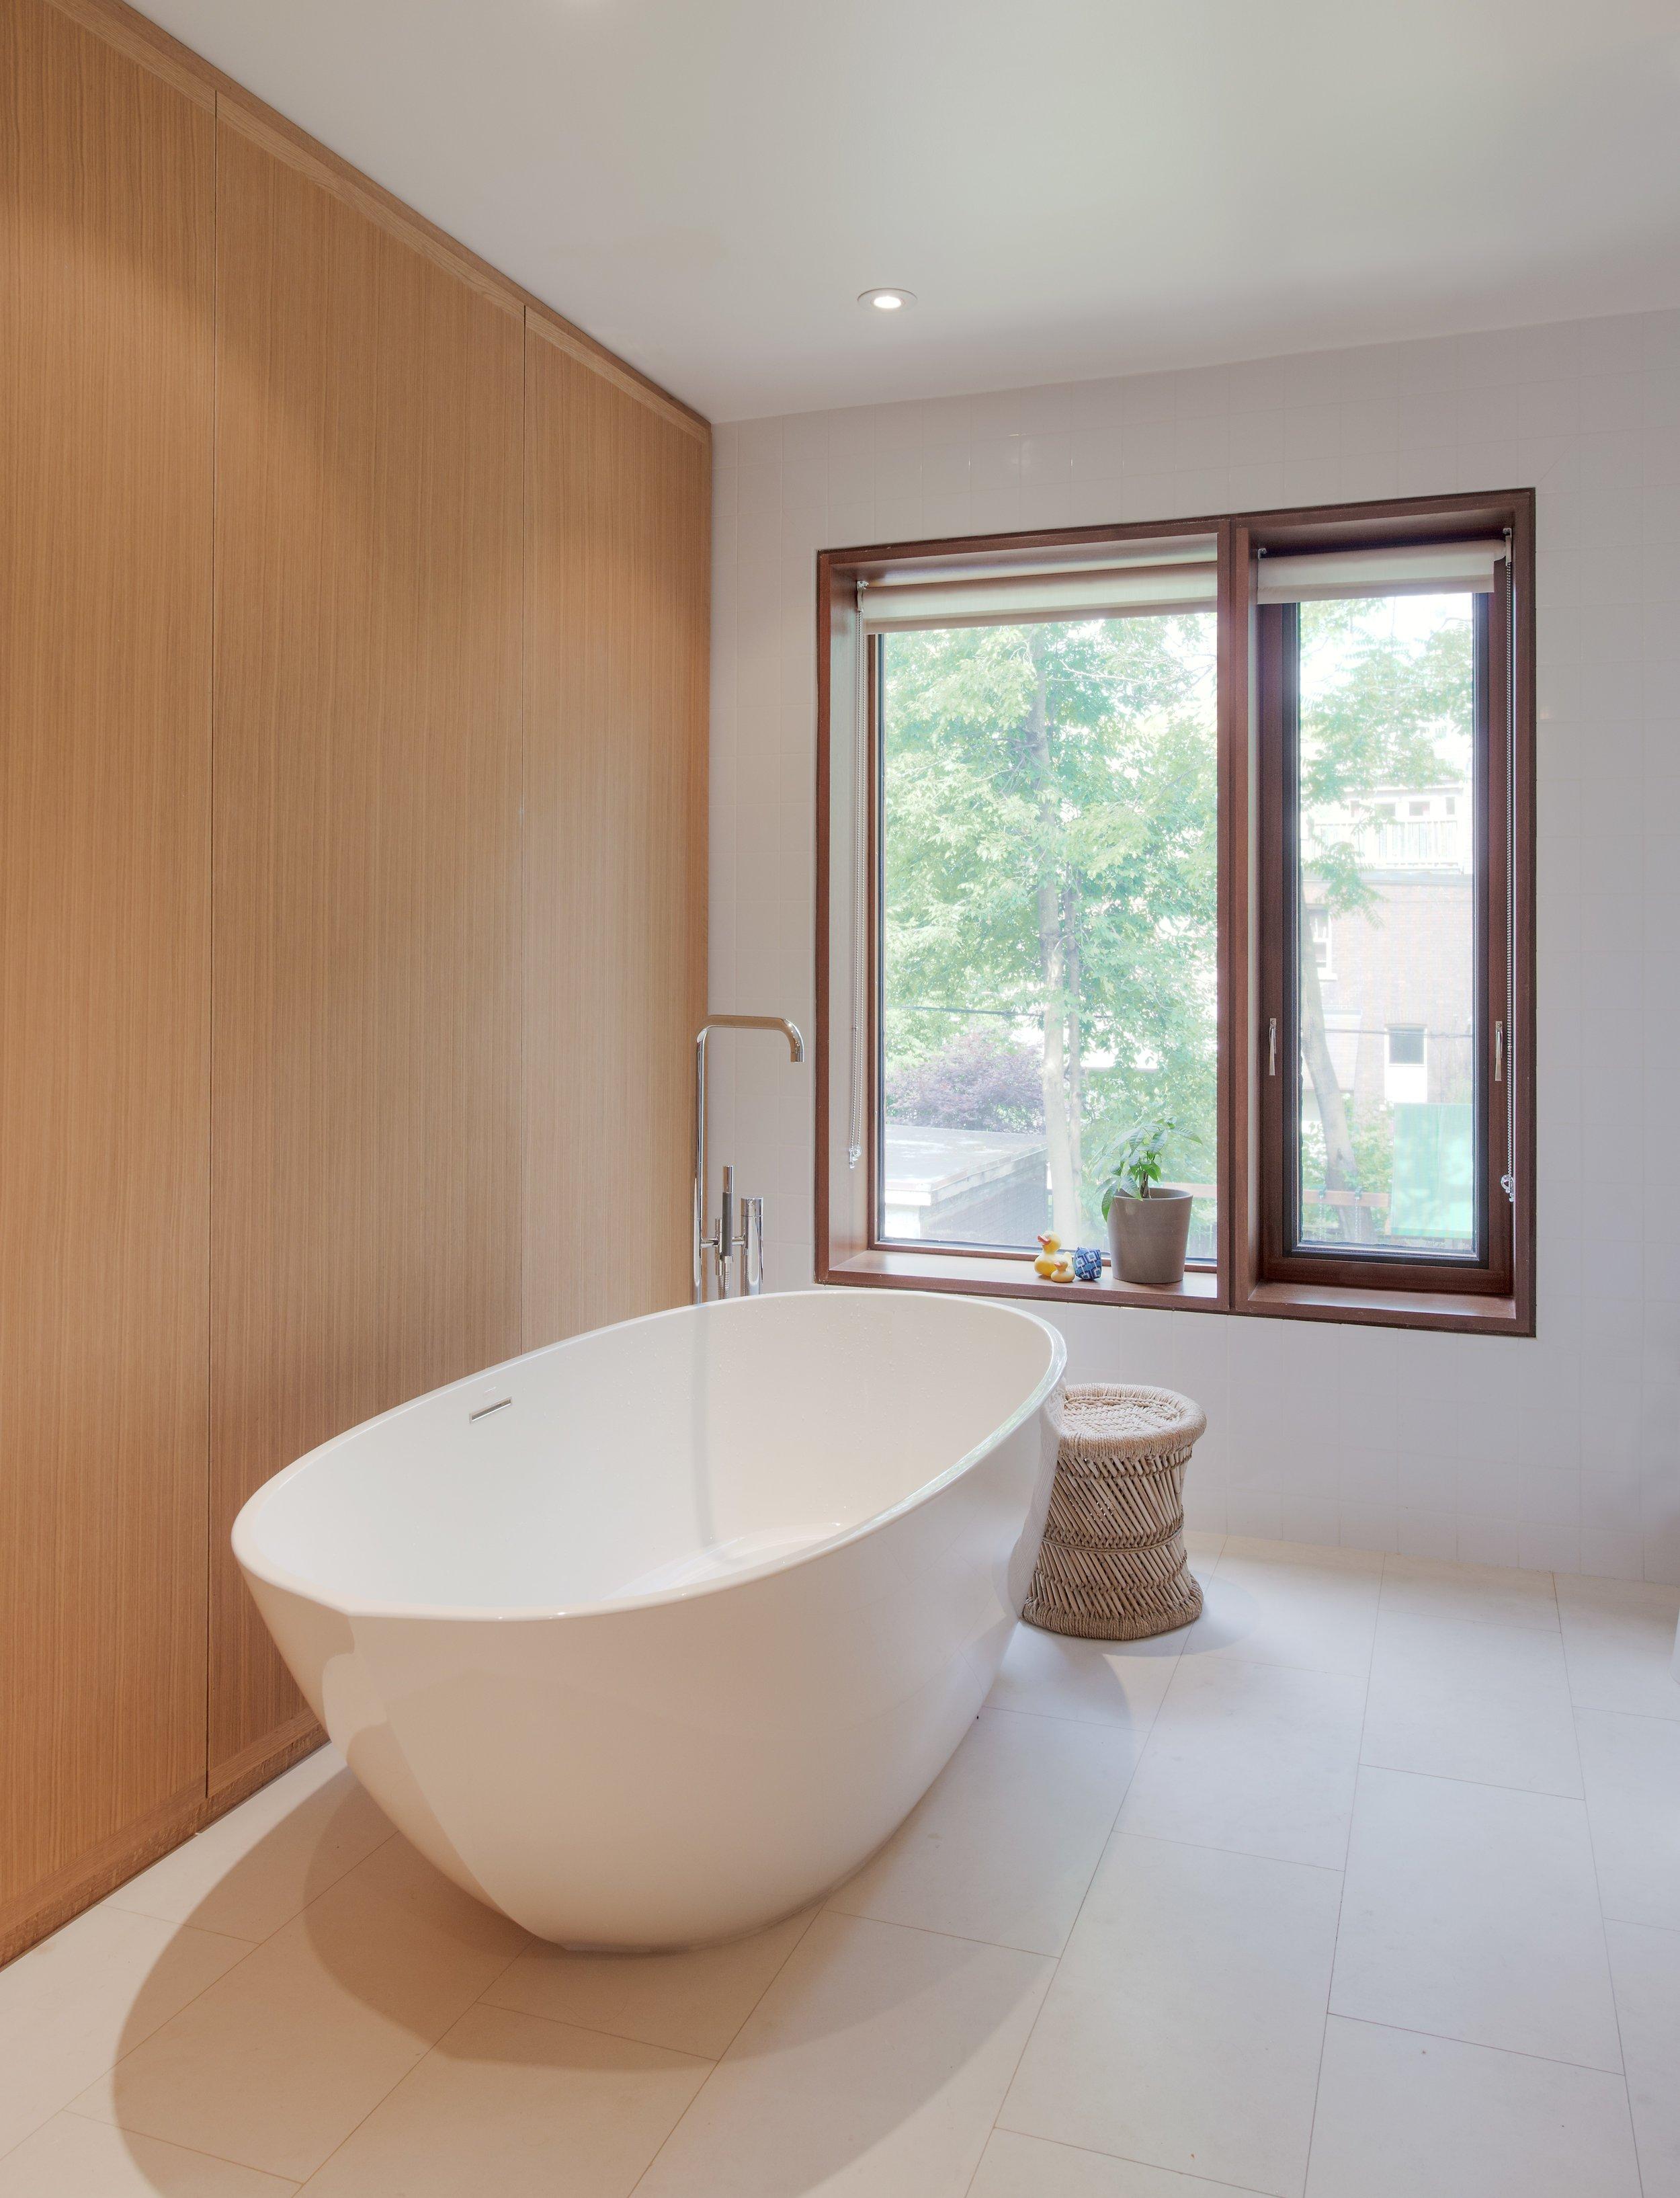 Howland Interior Master Bathroom